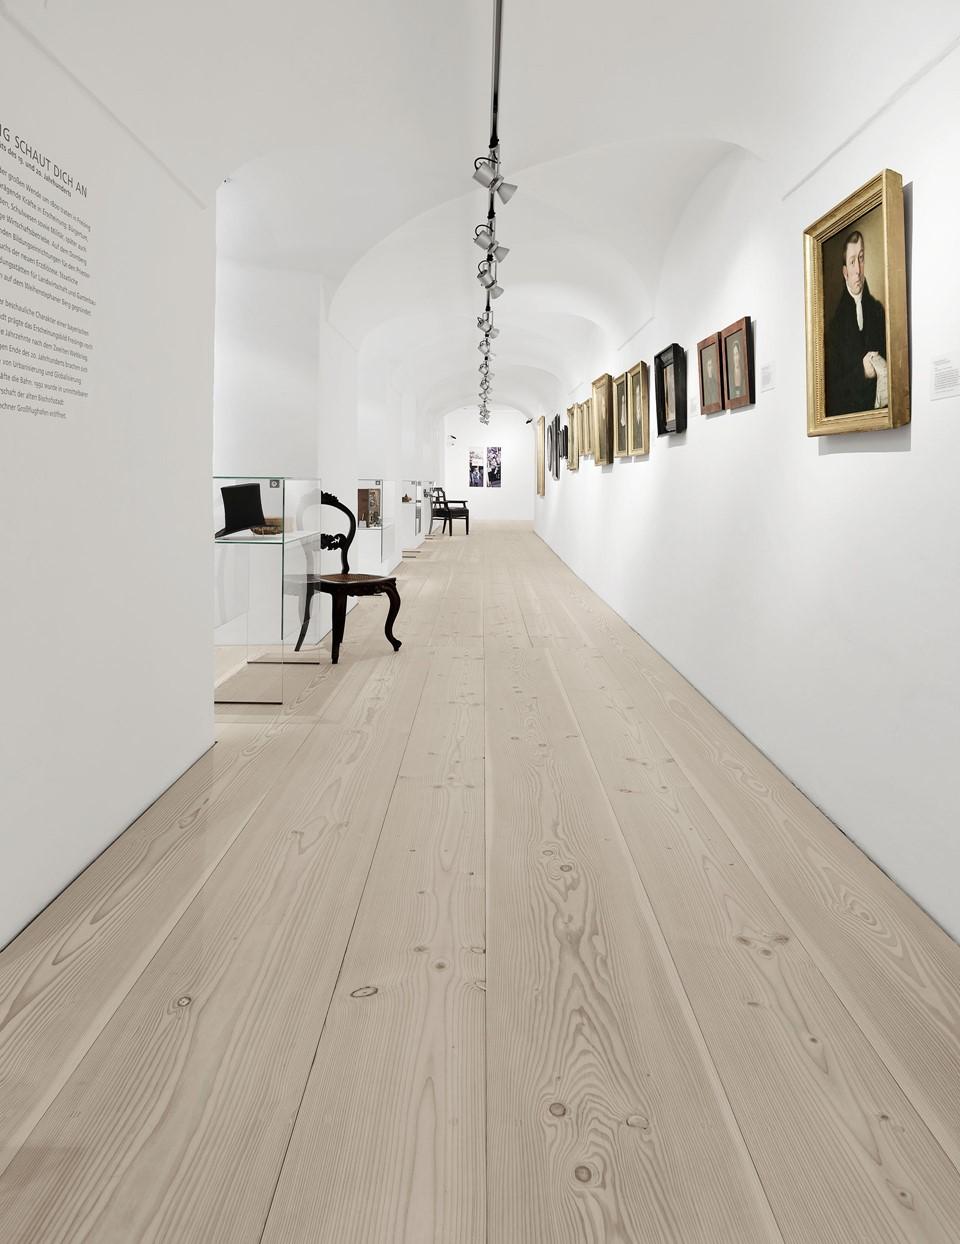 douglas-wood-floorboards_lye-natural-soap_stadtmuseum-freising_dinesen.jpg